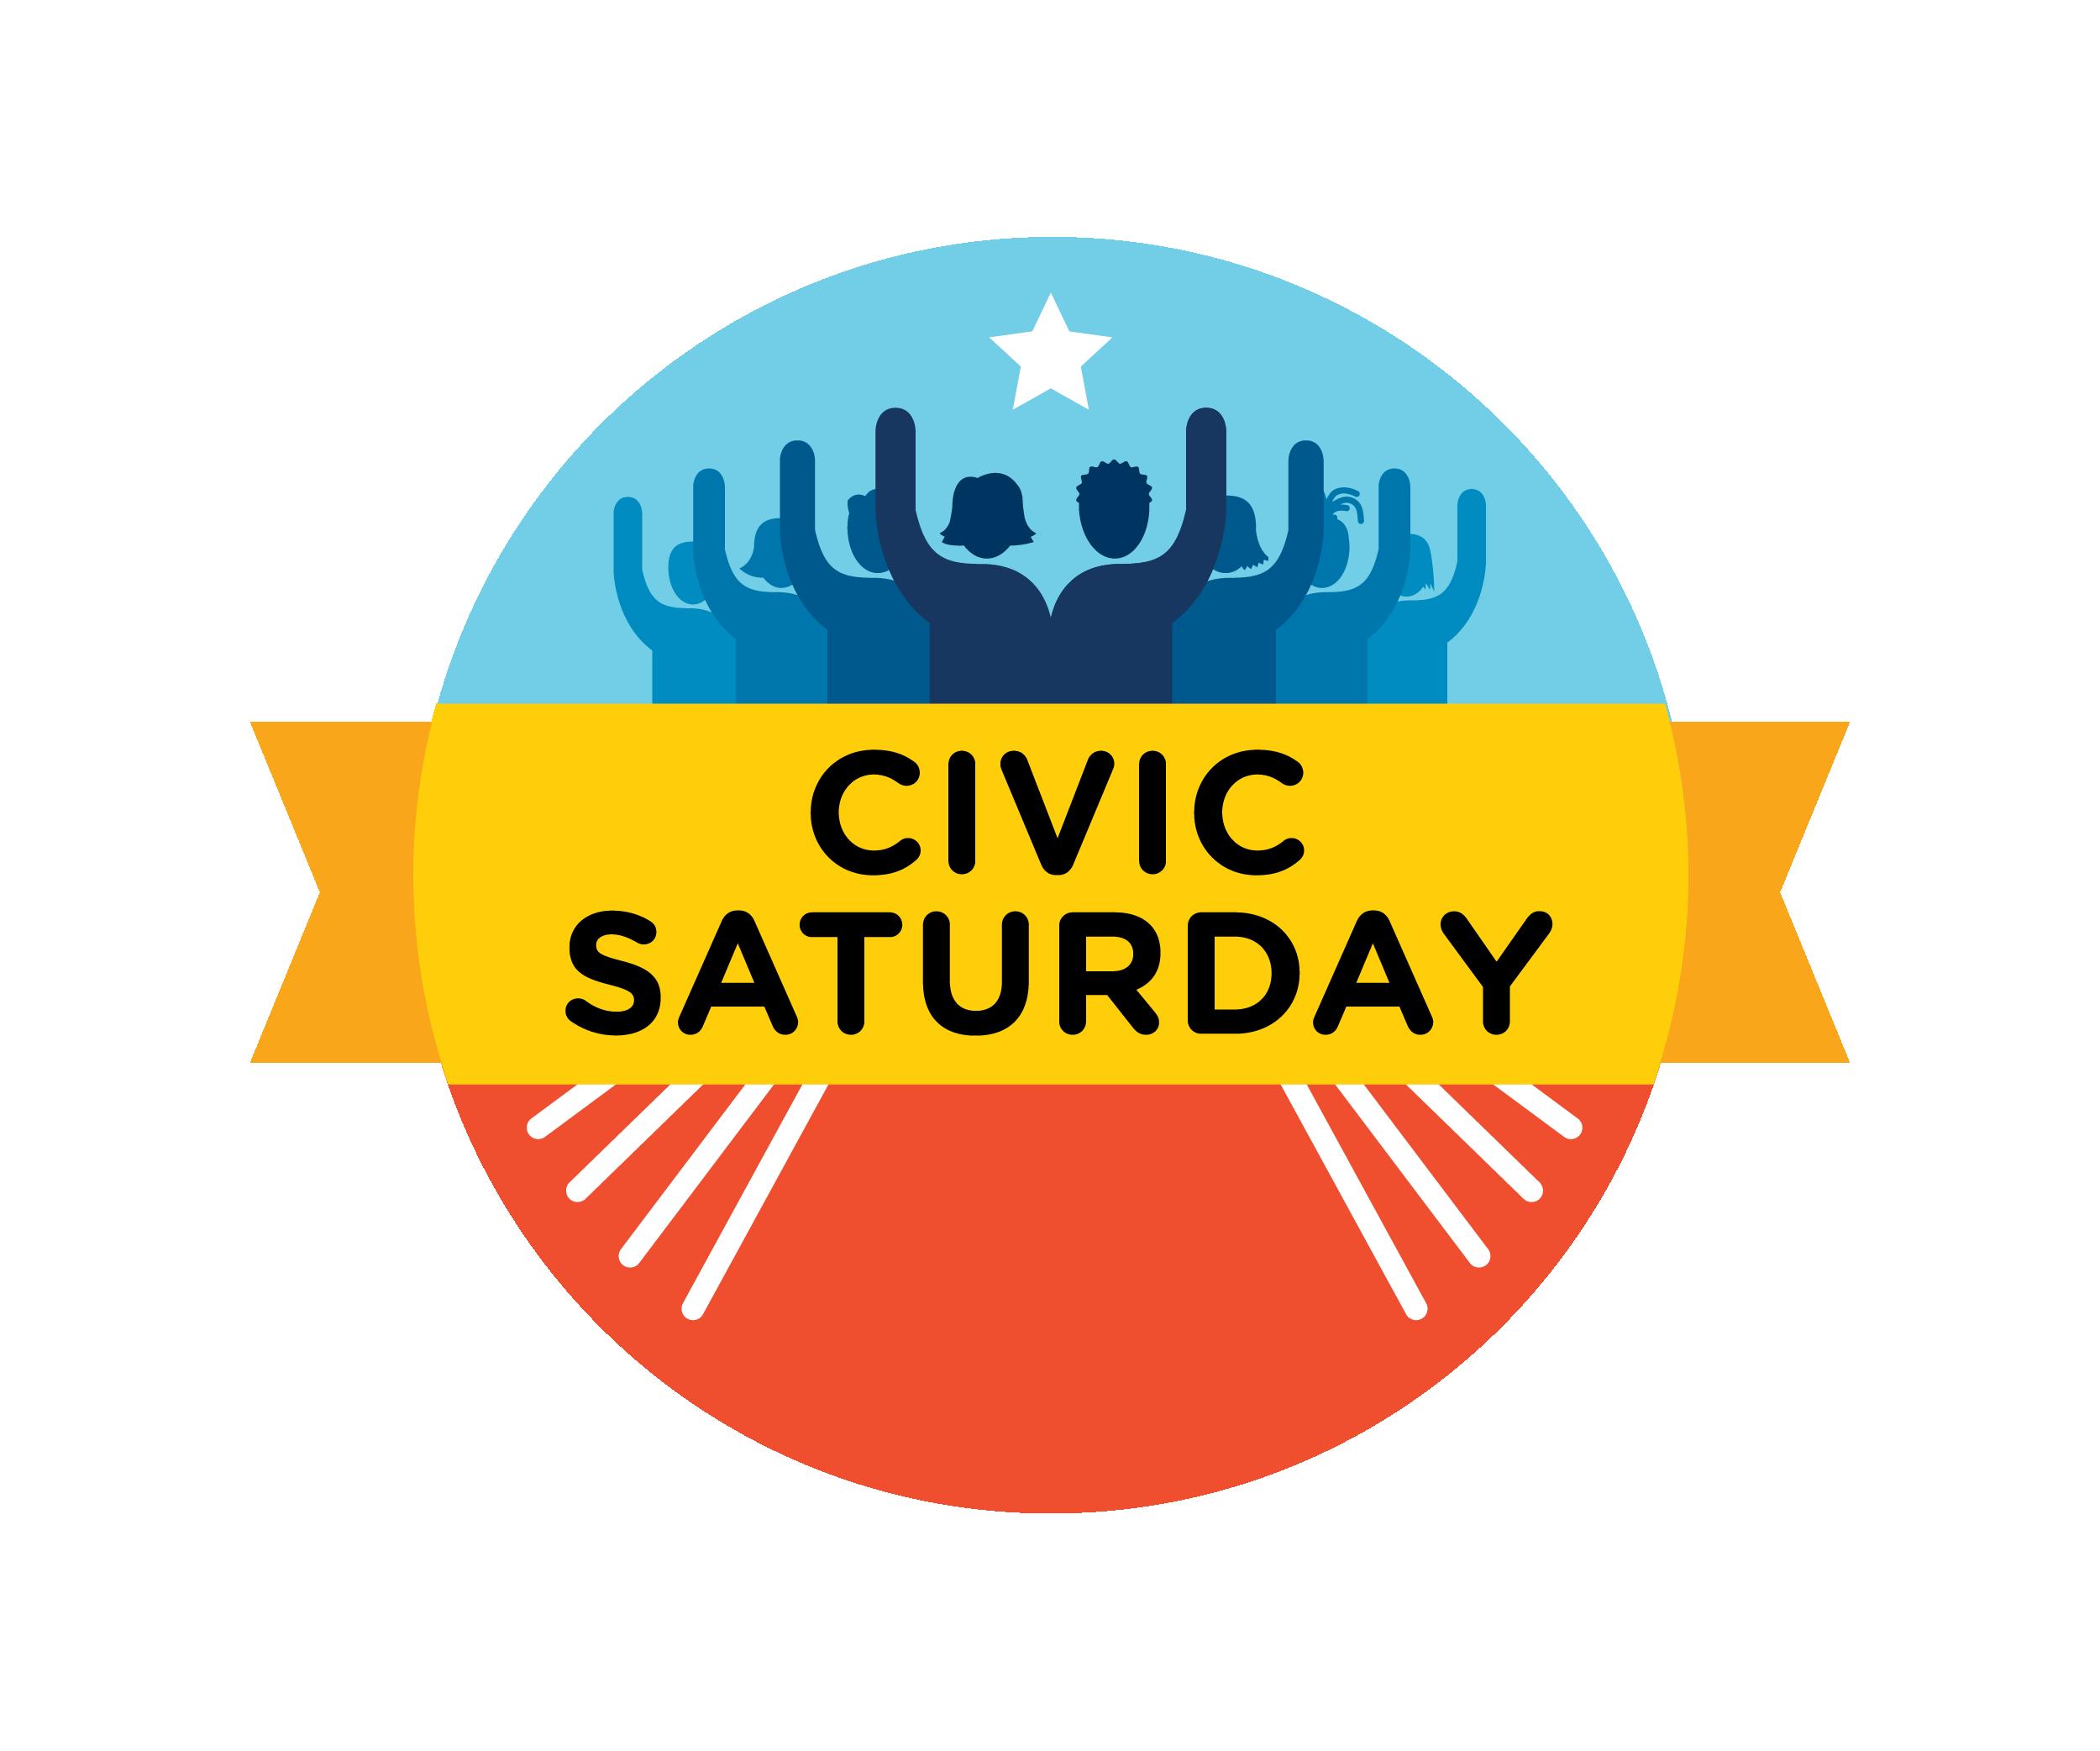 Citizen University's Civic Saturday logo